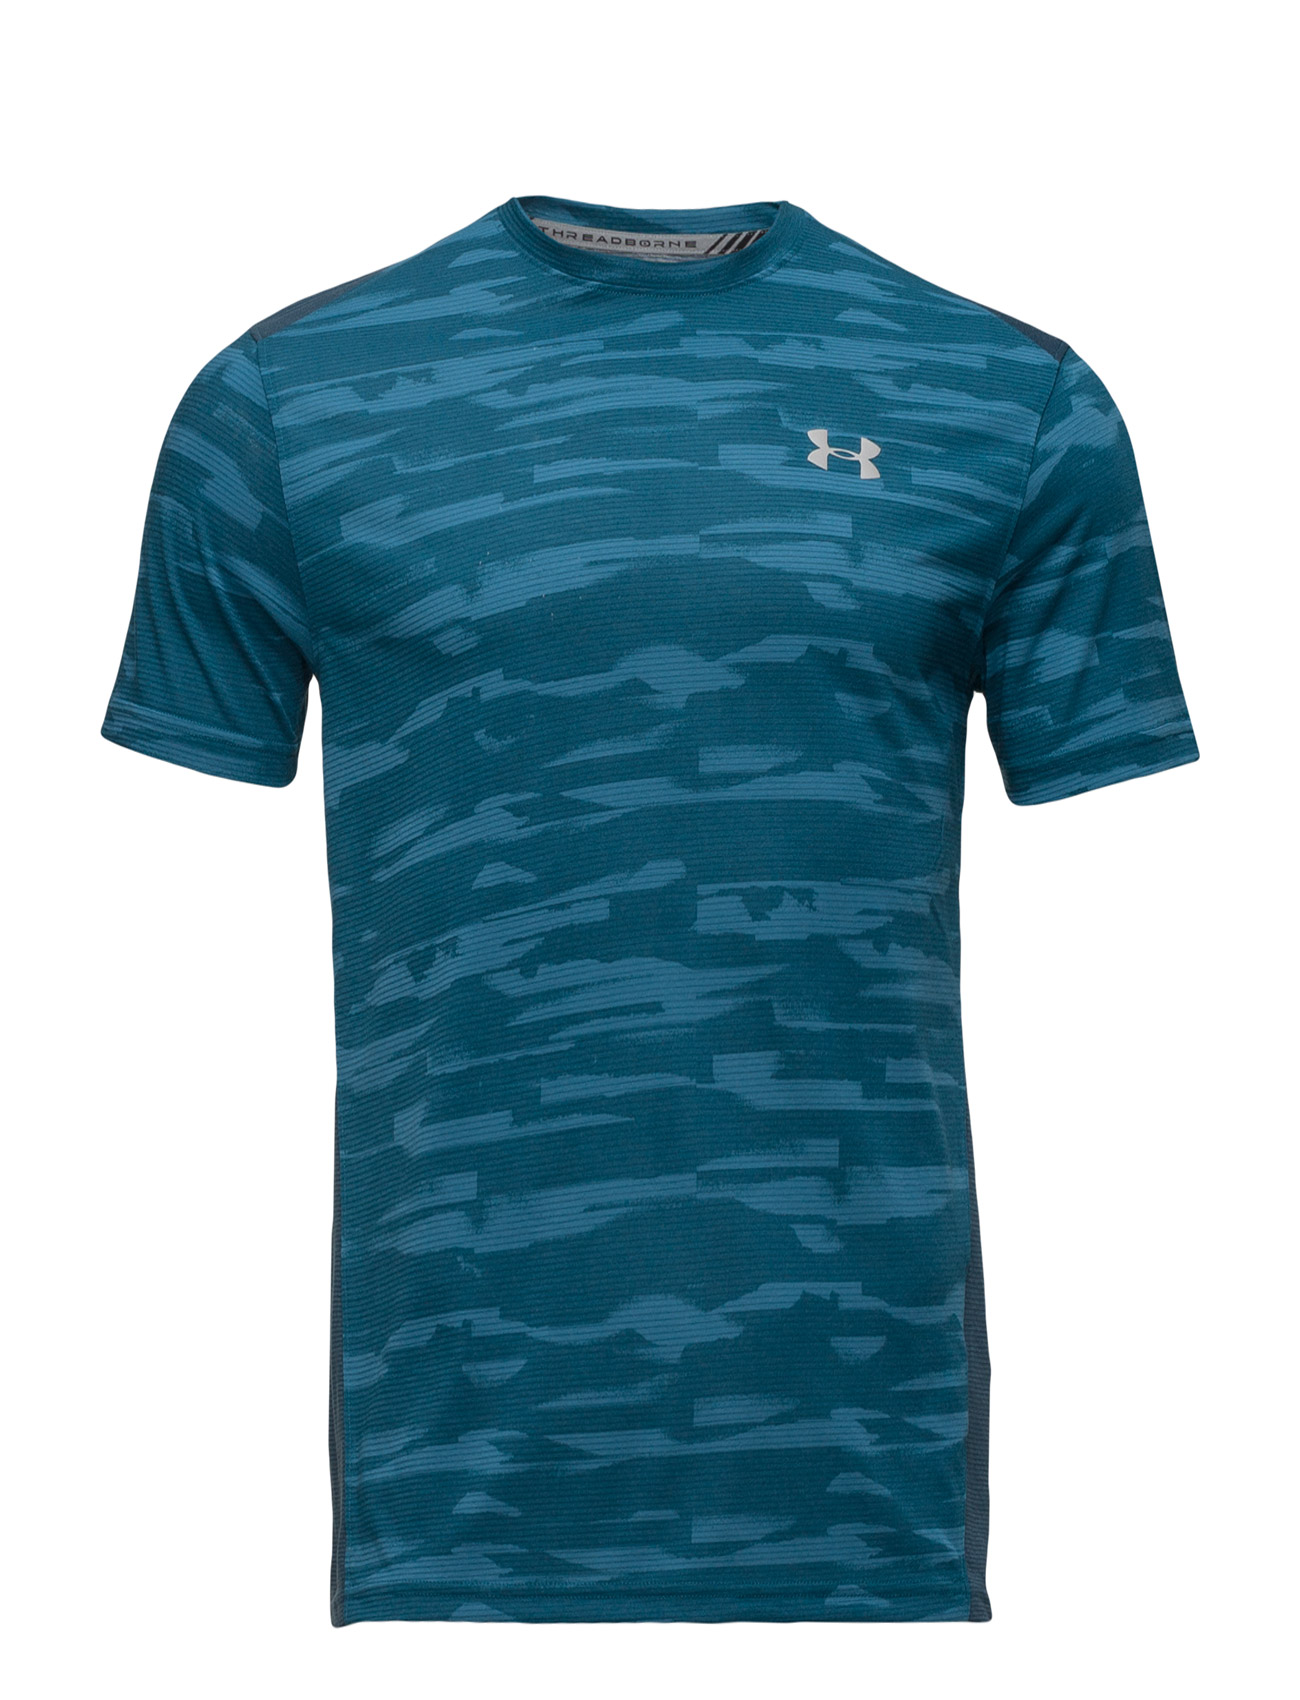 Threadborne Run Mesh Ss Under Armour Løbe t-shirts til Herrer i